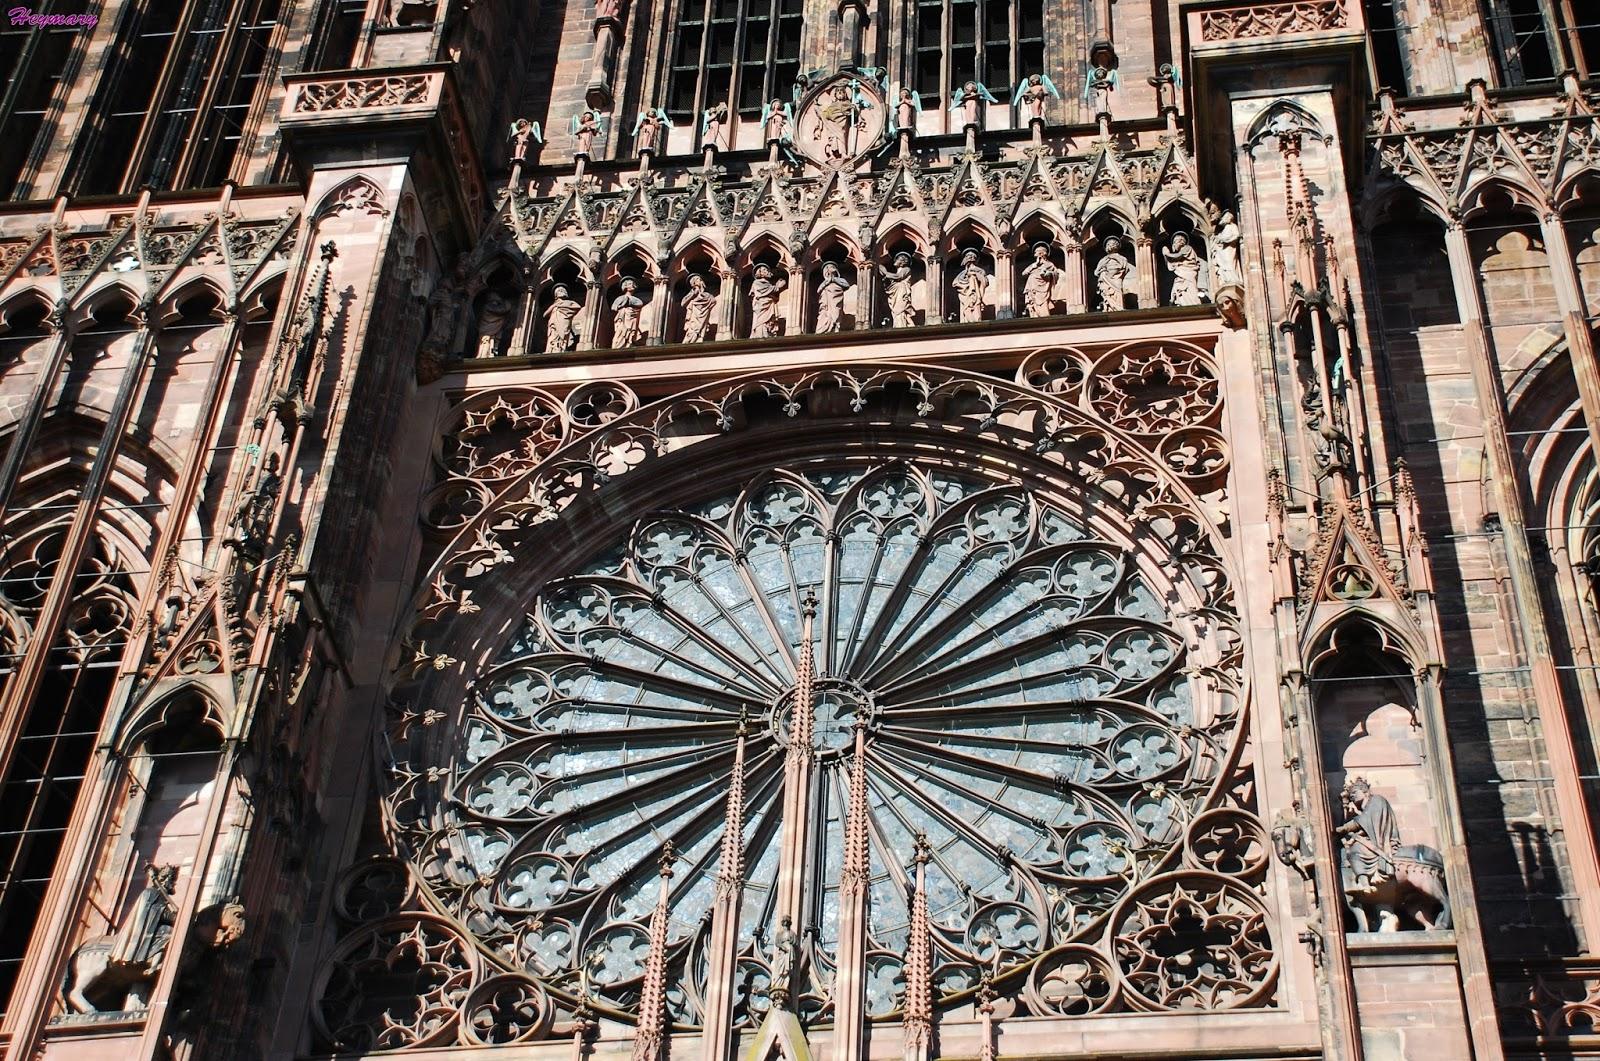 Amorino純天然的花朵冰淇淋聖母院指的就是聖母瑪利亞是天主教堂